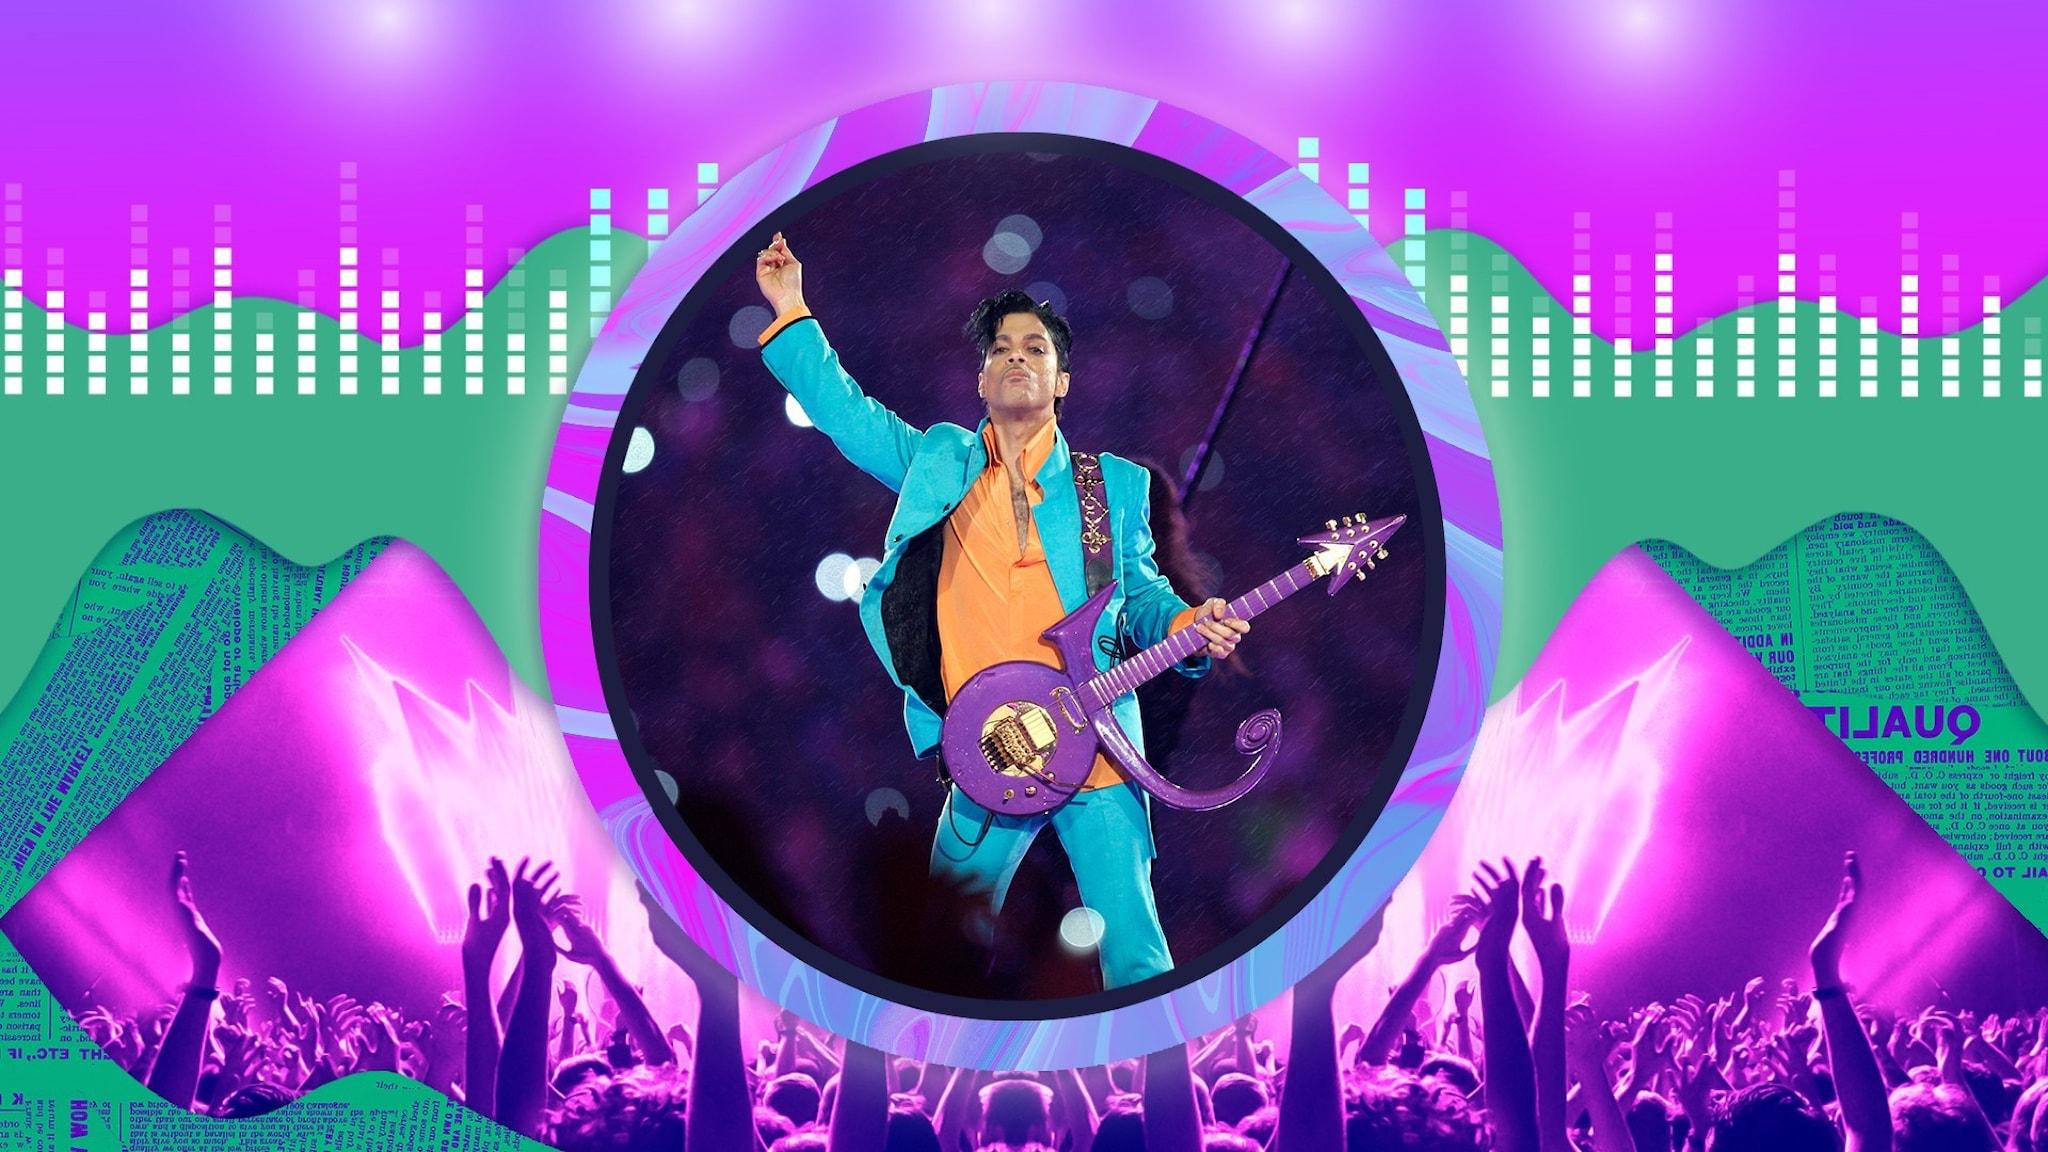 Prince - den mytomspunne perfektionisten